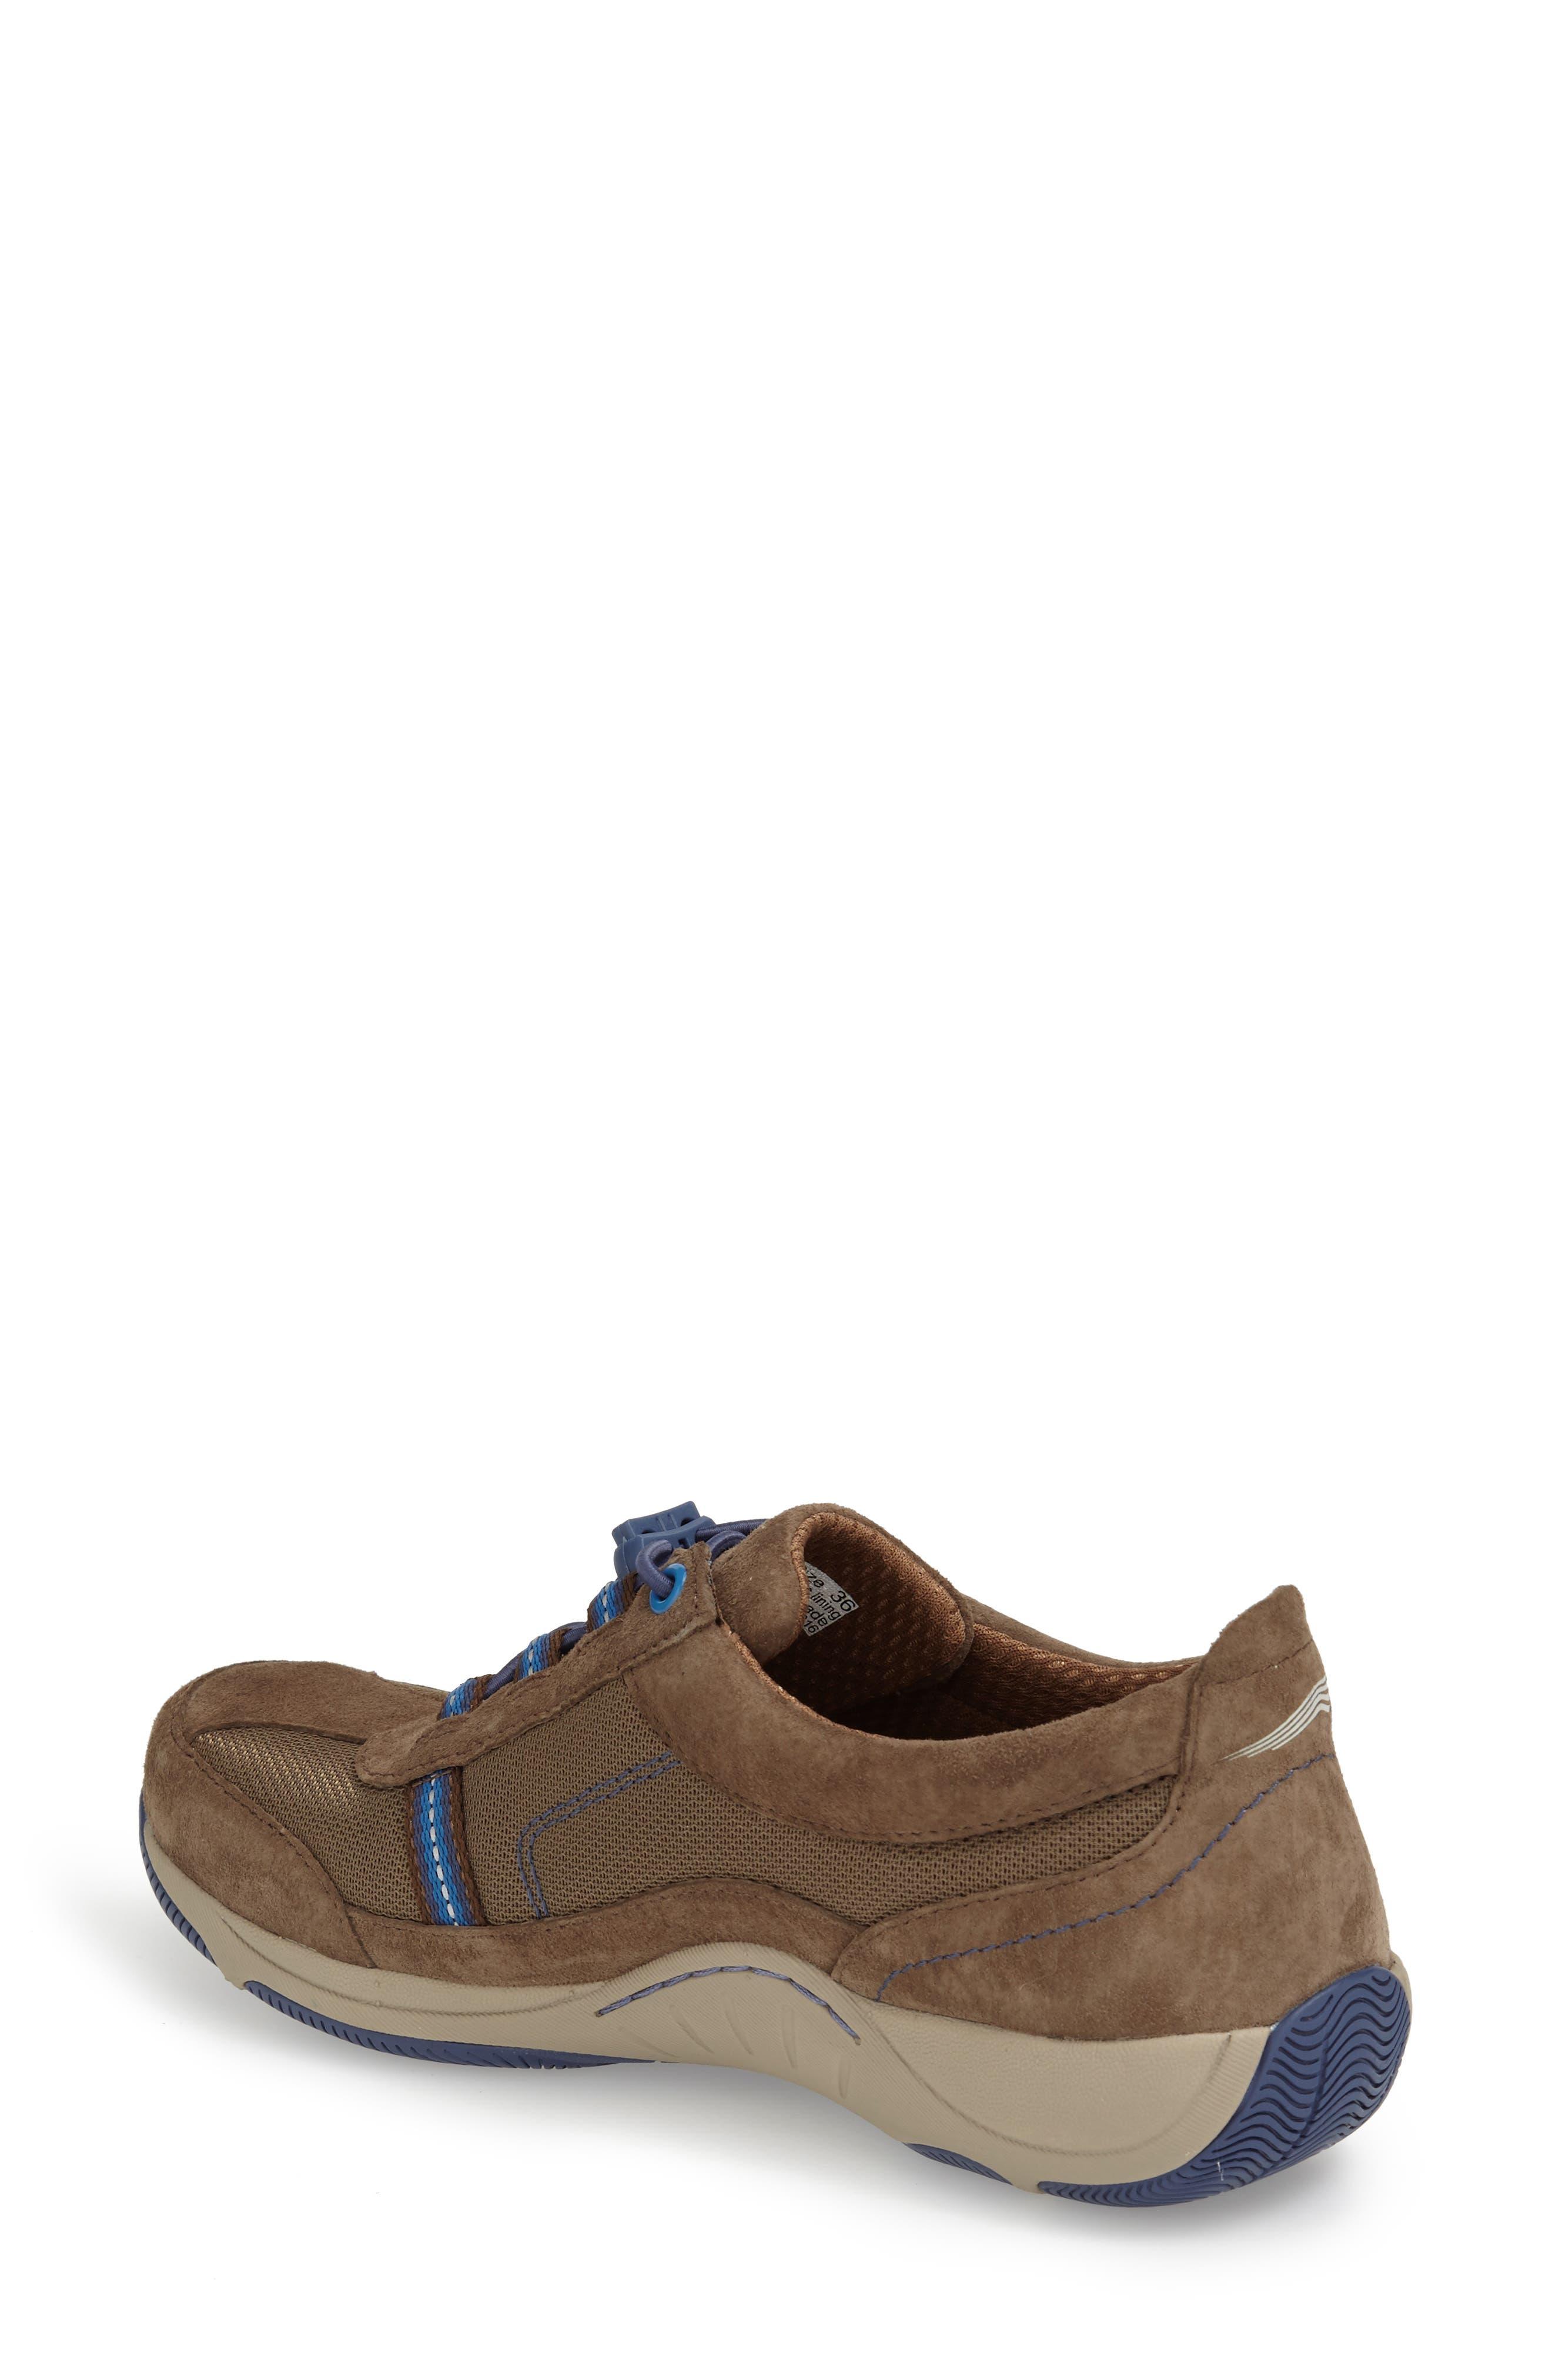 'Helen' Suede & Mesh Sneaker,                             Alternate thumbnail 84, color,